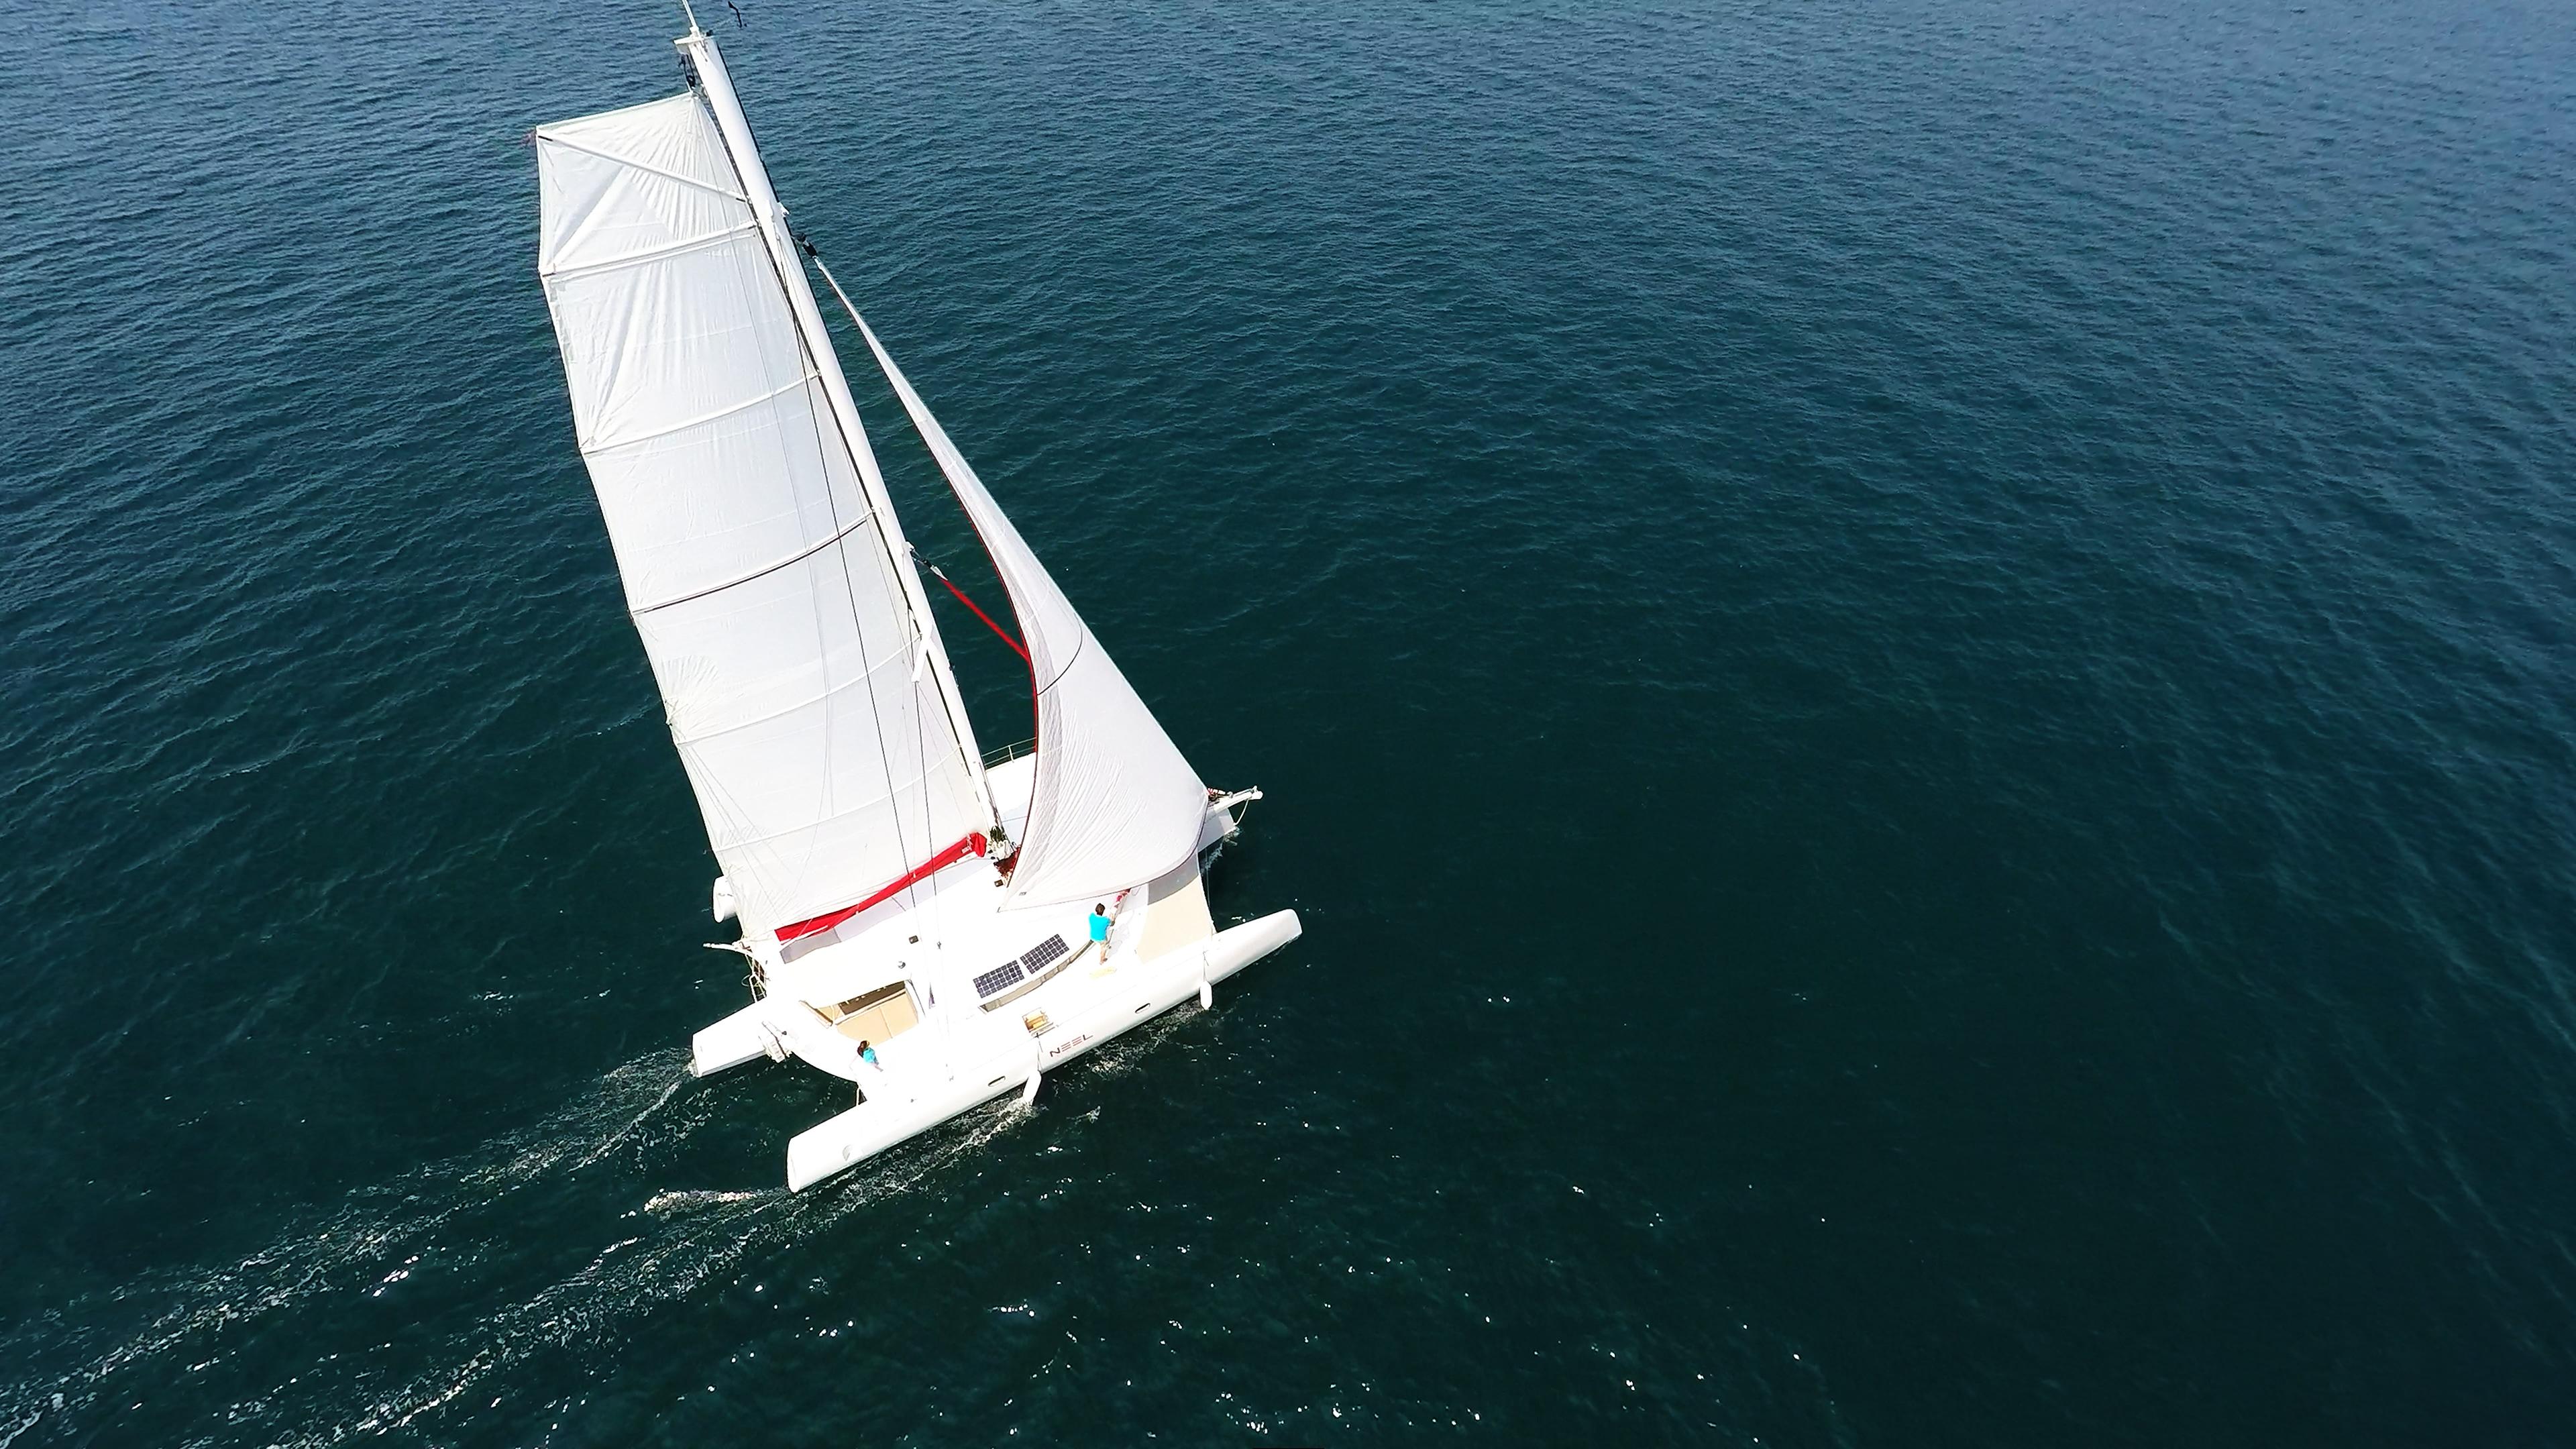 trimaran aerial photo sailing yacht